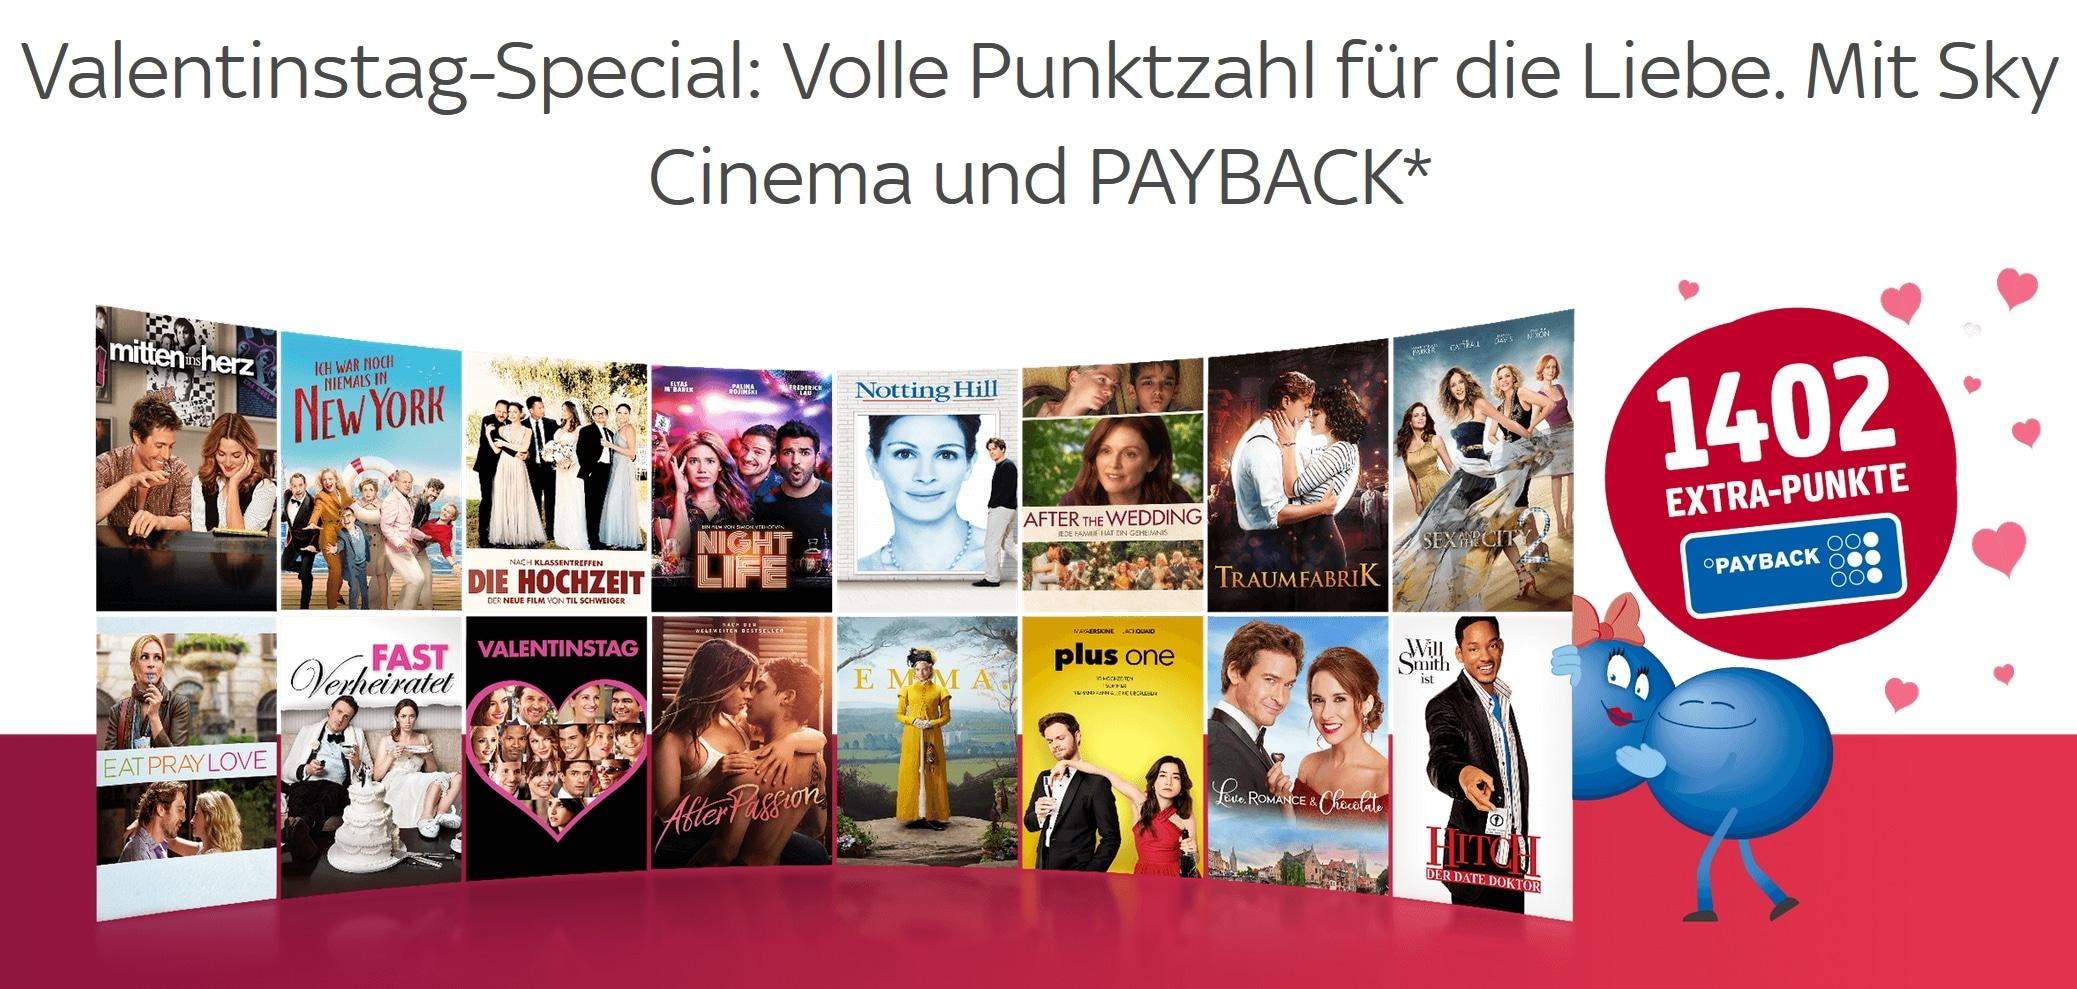 sky-cinema-angebote-valentinstags-special-angebot